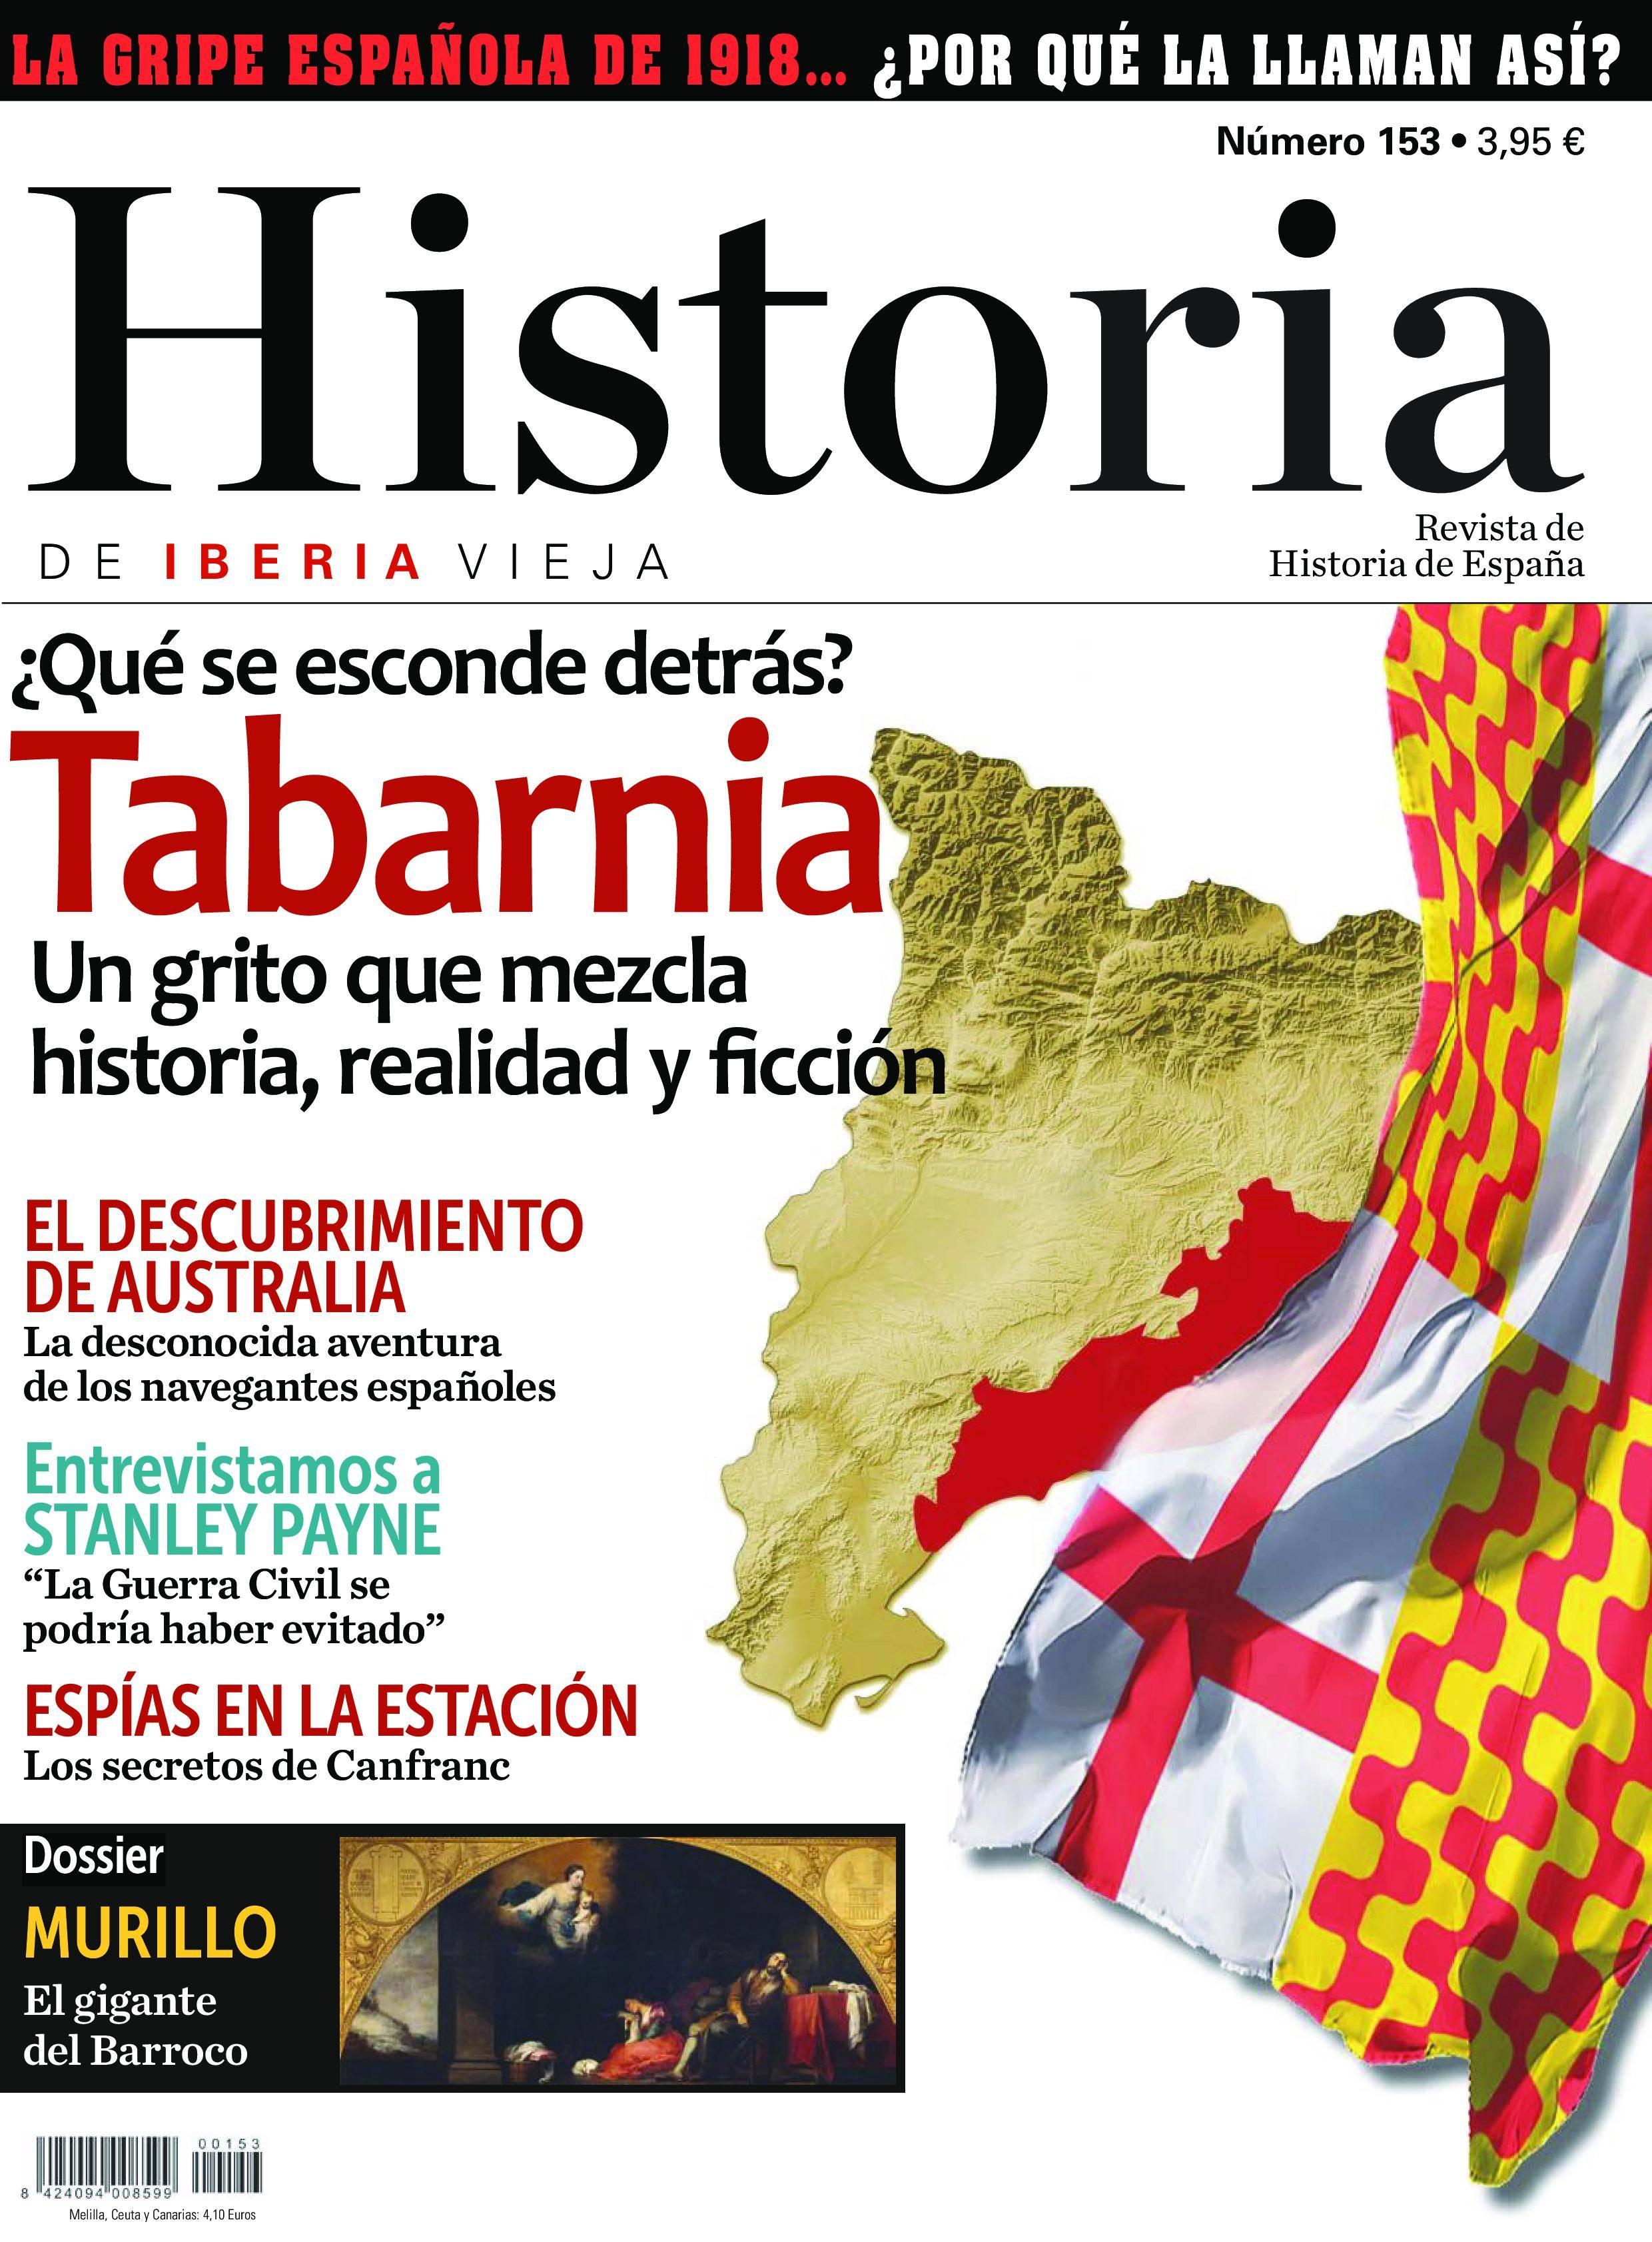 Historia de Iberia Vieja - marzo 2018